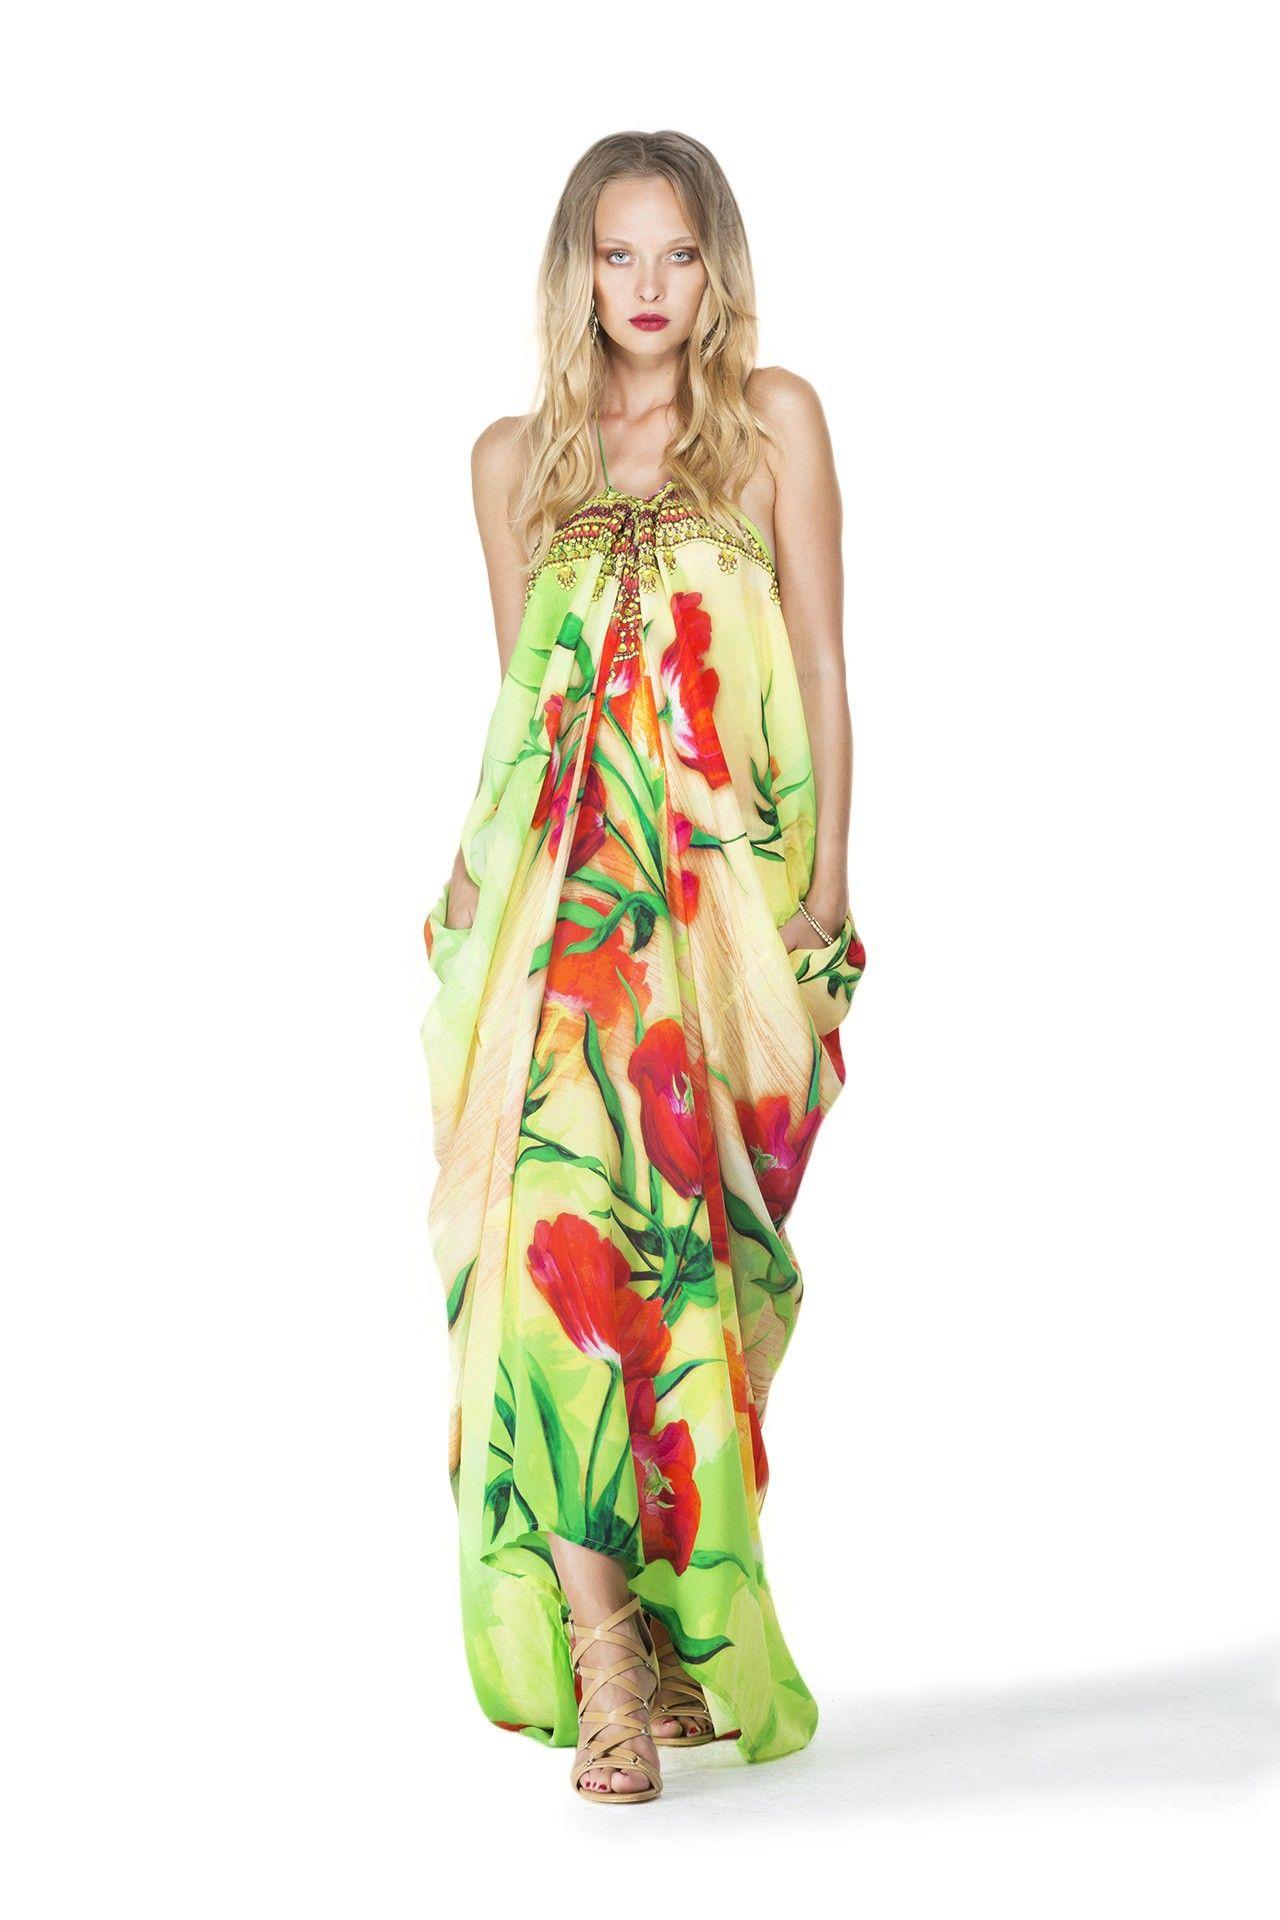 Designer maxi caftan dresses cute floral clothing in